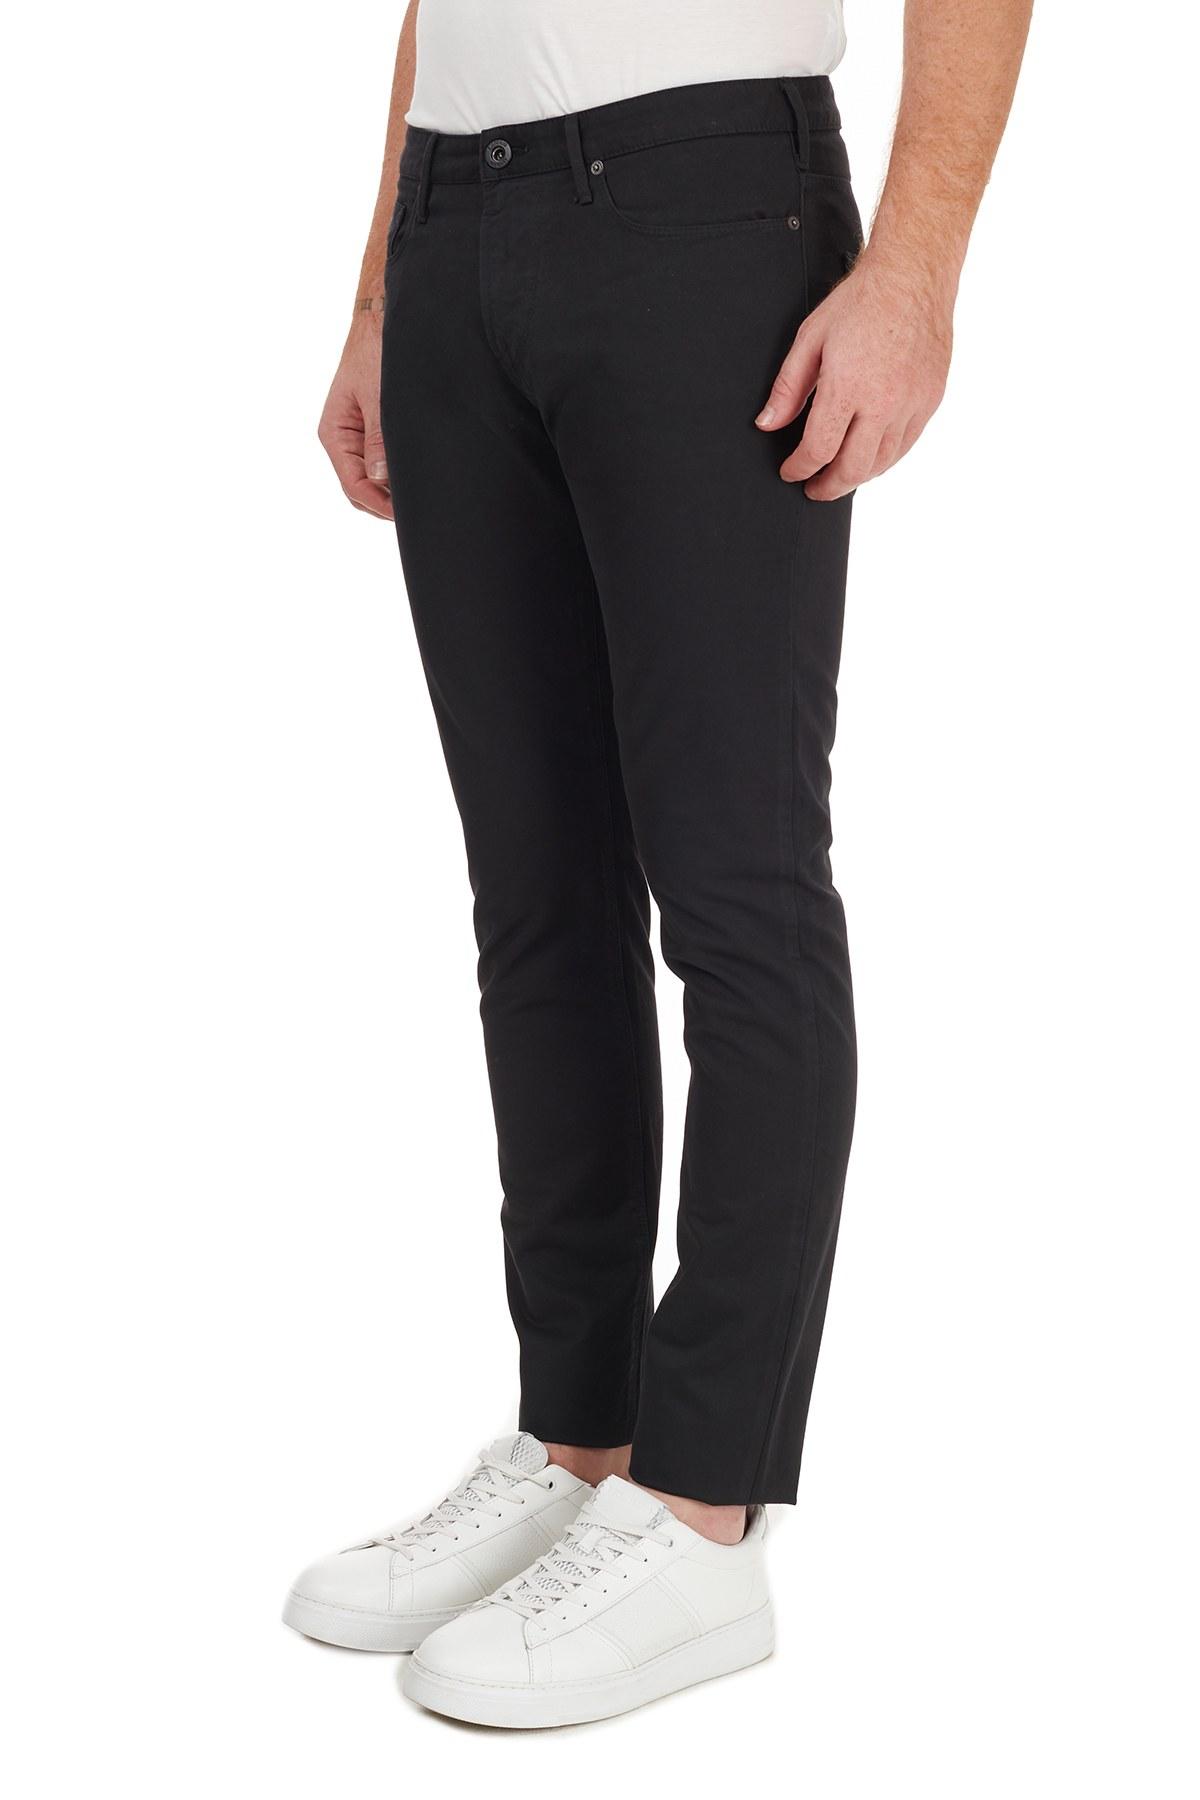 Emporio Armani % 100 Pamuklu Slim Fit J06 Jeans Erkek Kot Pantolon 6H1J06 1NF9Z 0999 SİYAH